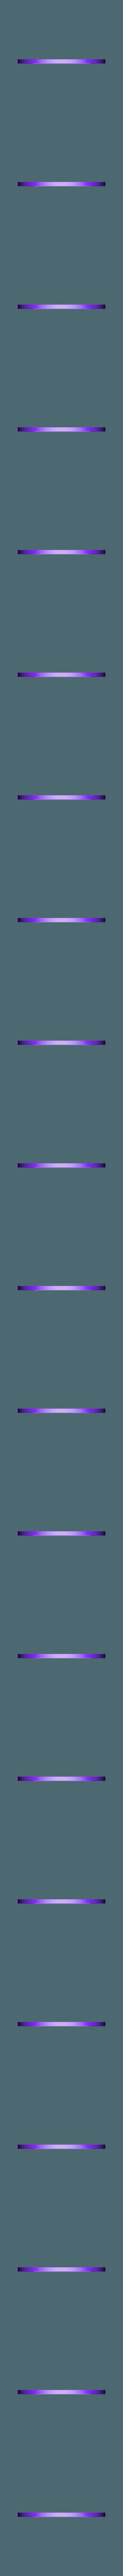 Lakers_purple.STL Download free STL file Minimal Multi-color NBA coasters • 3D print object, MosaicManufacturing